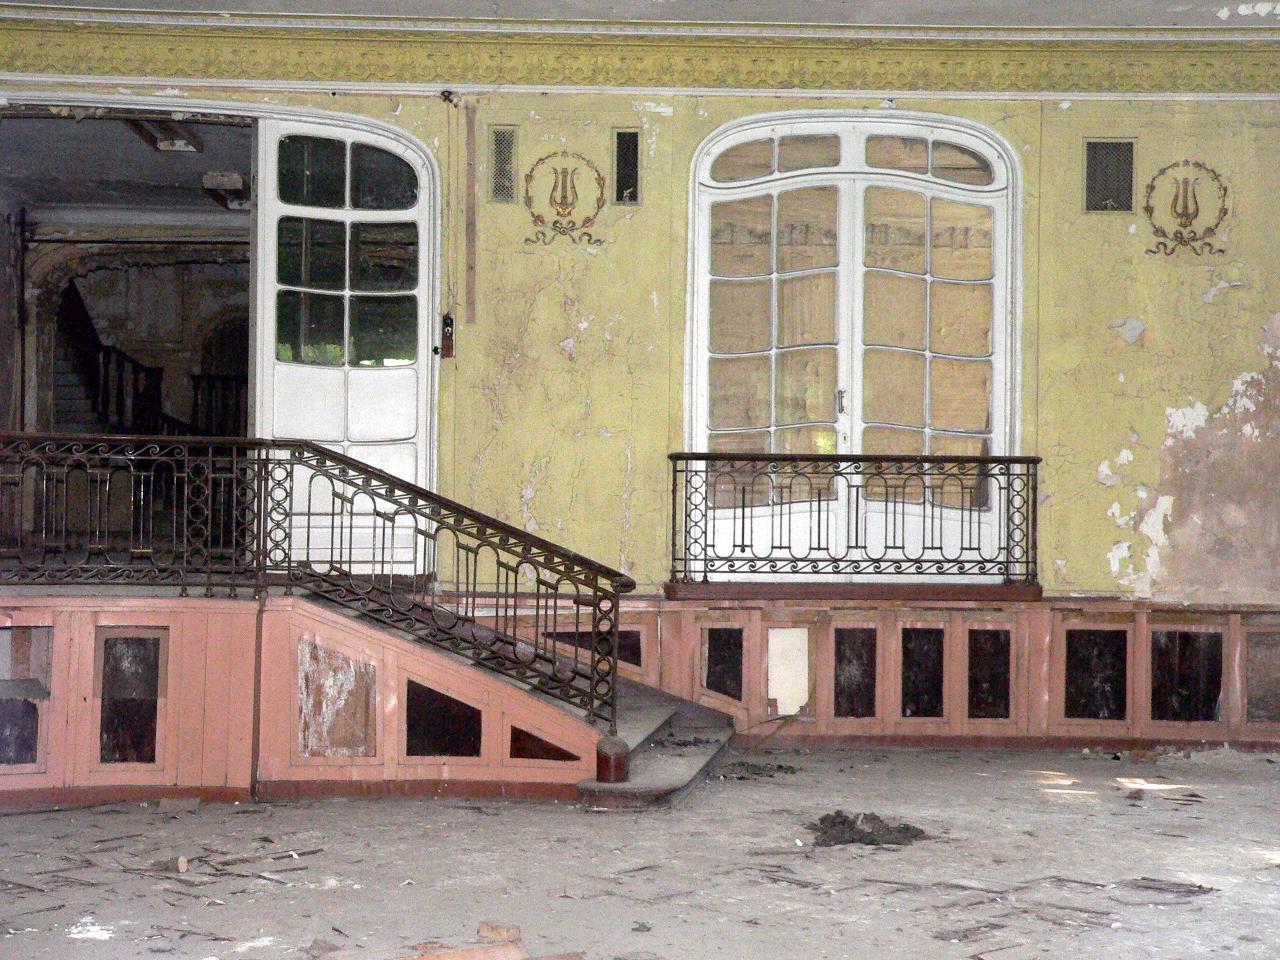 Дача А. Фаберже. Добавил: Suokas (citywalls.ru)